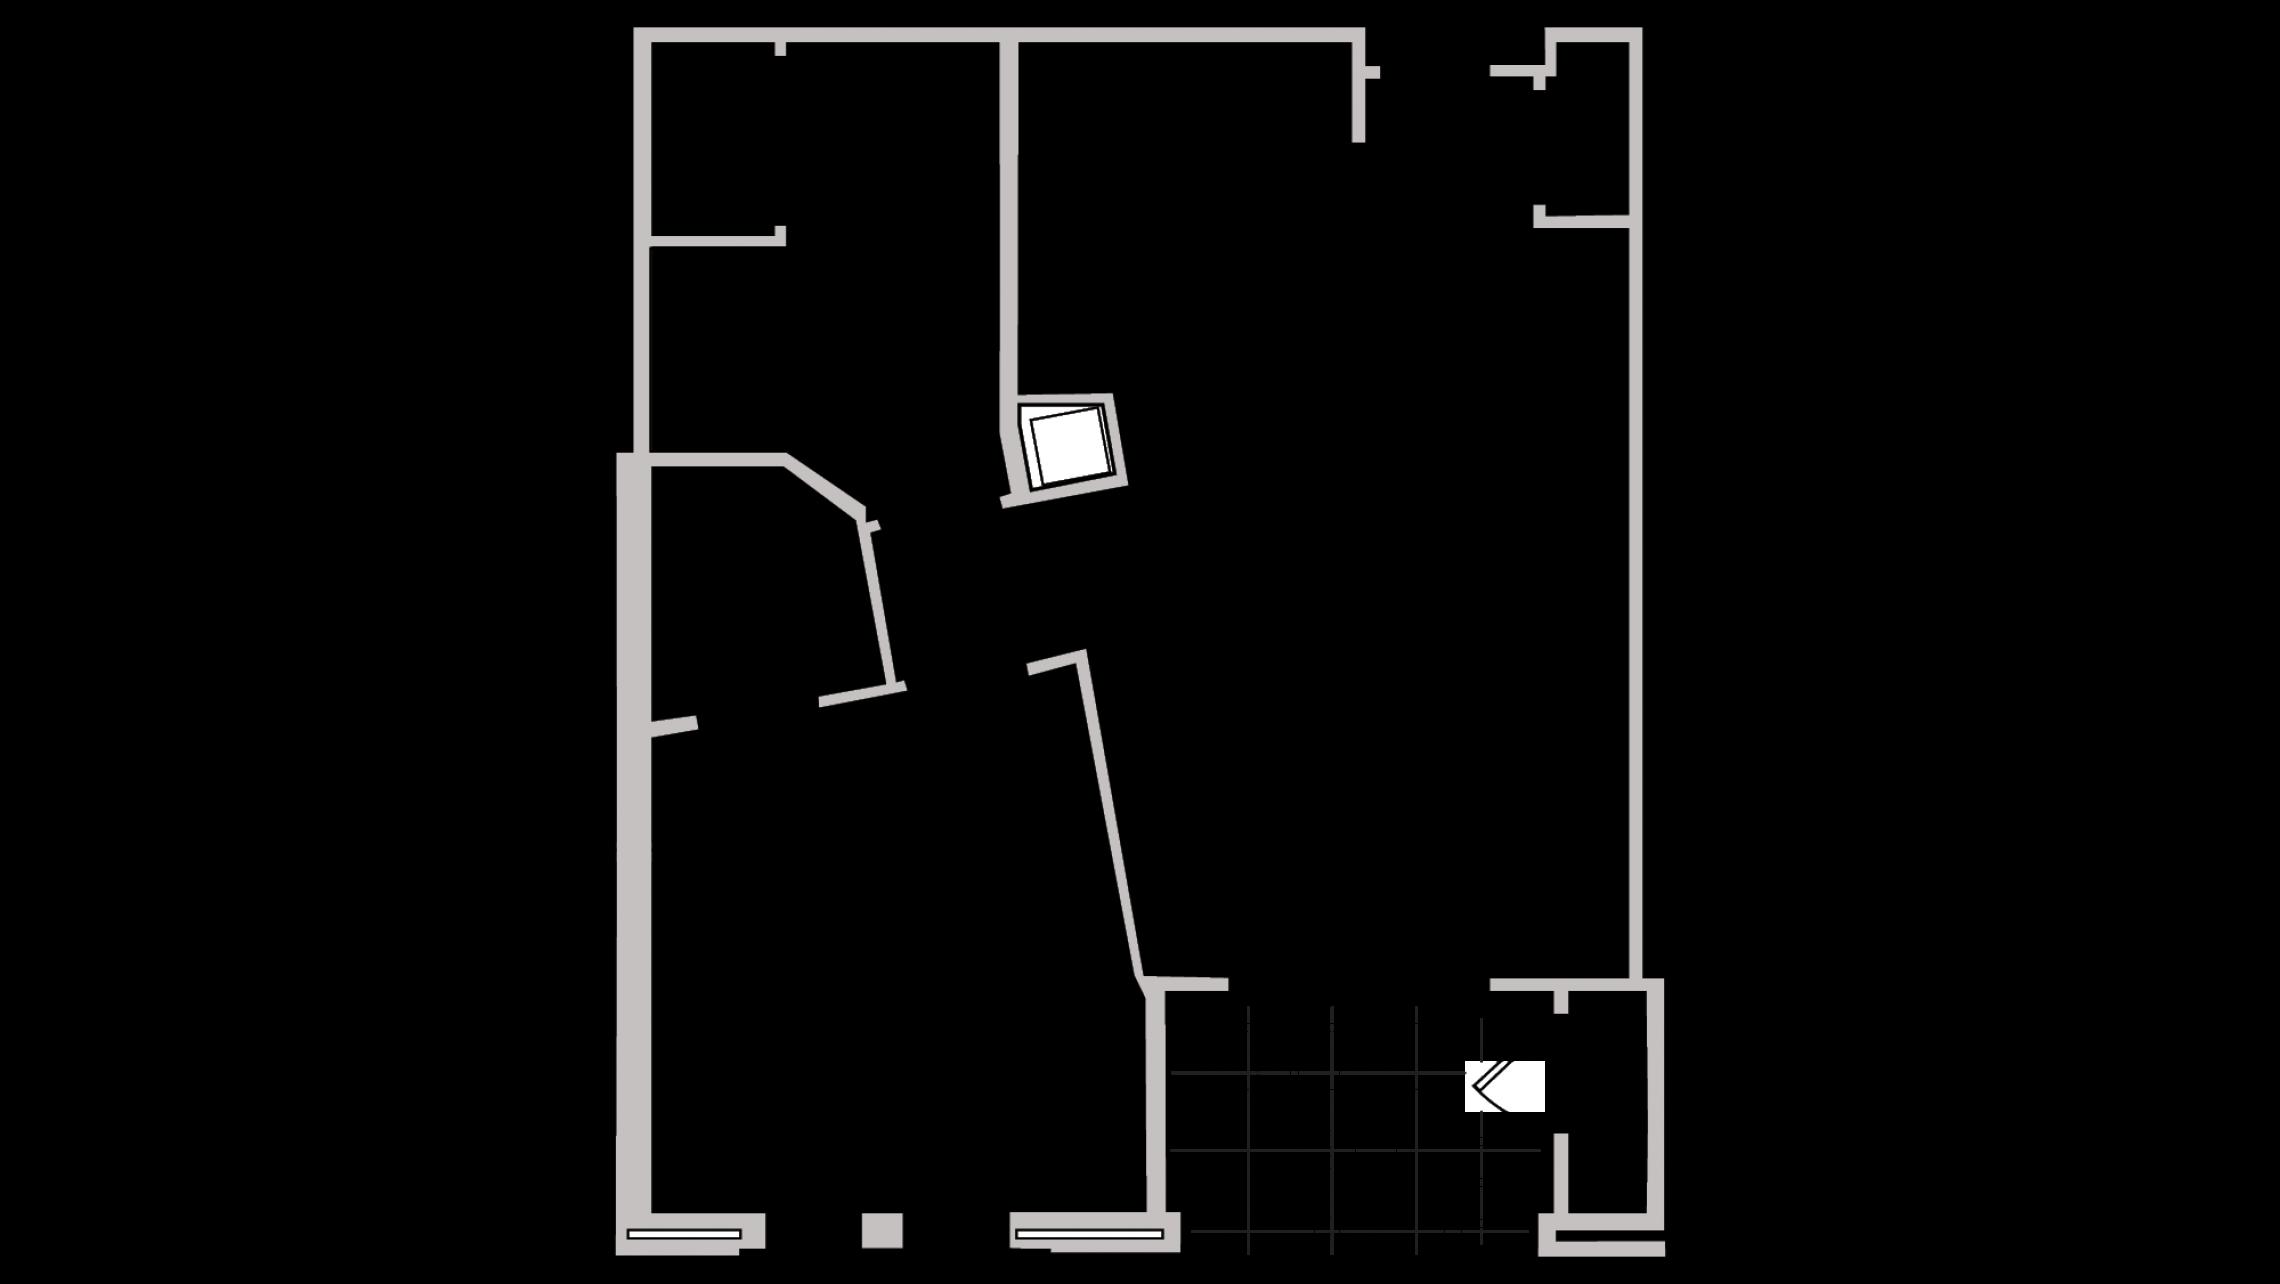 ULI The Depot 1-414 - One Bedroom, One Bathroom